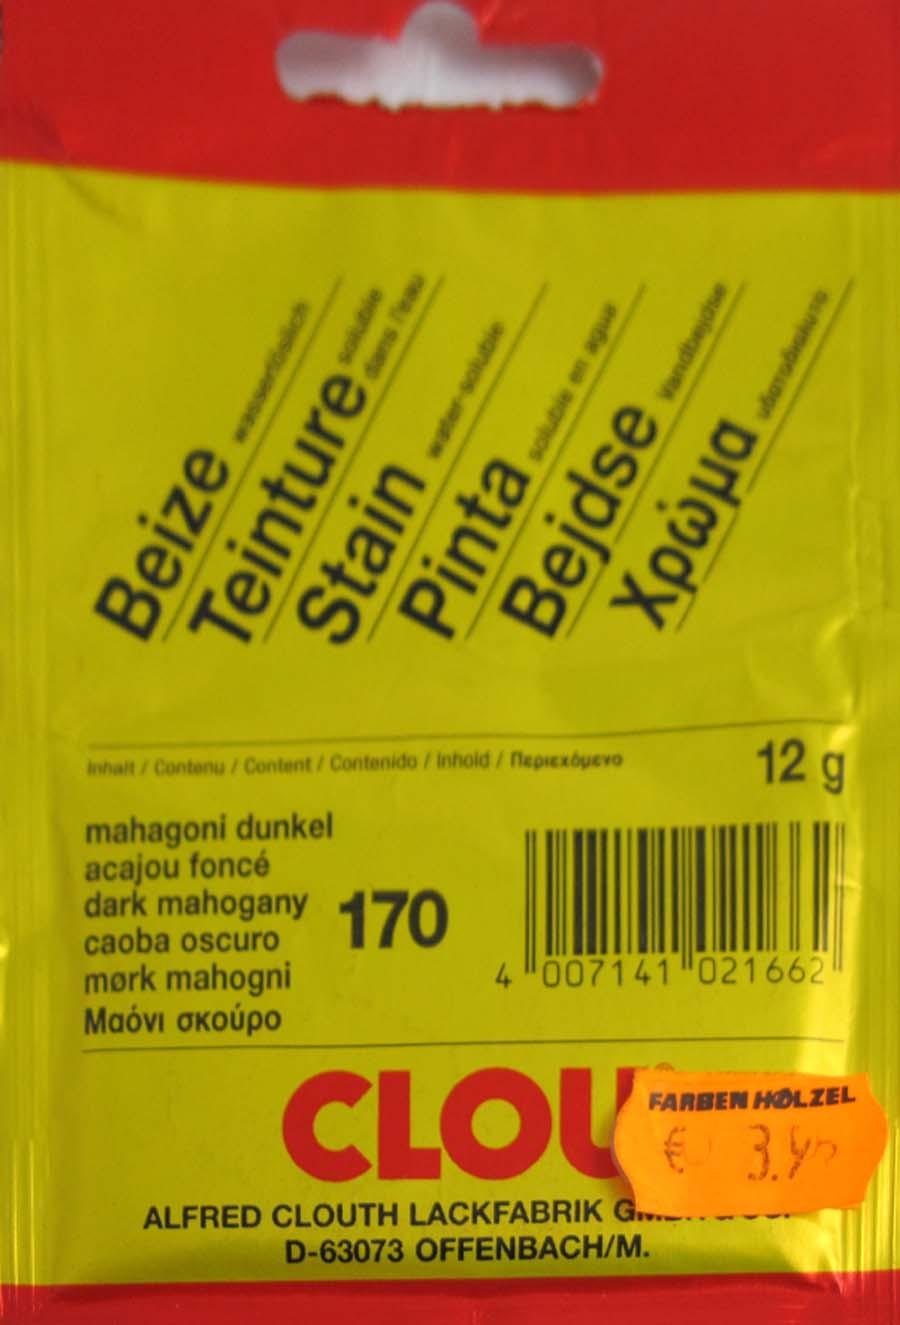 Beize Mahagoni dunkel 170 wasserlöslich 12 g Clou